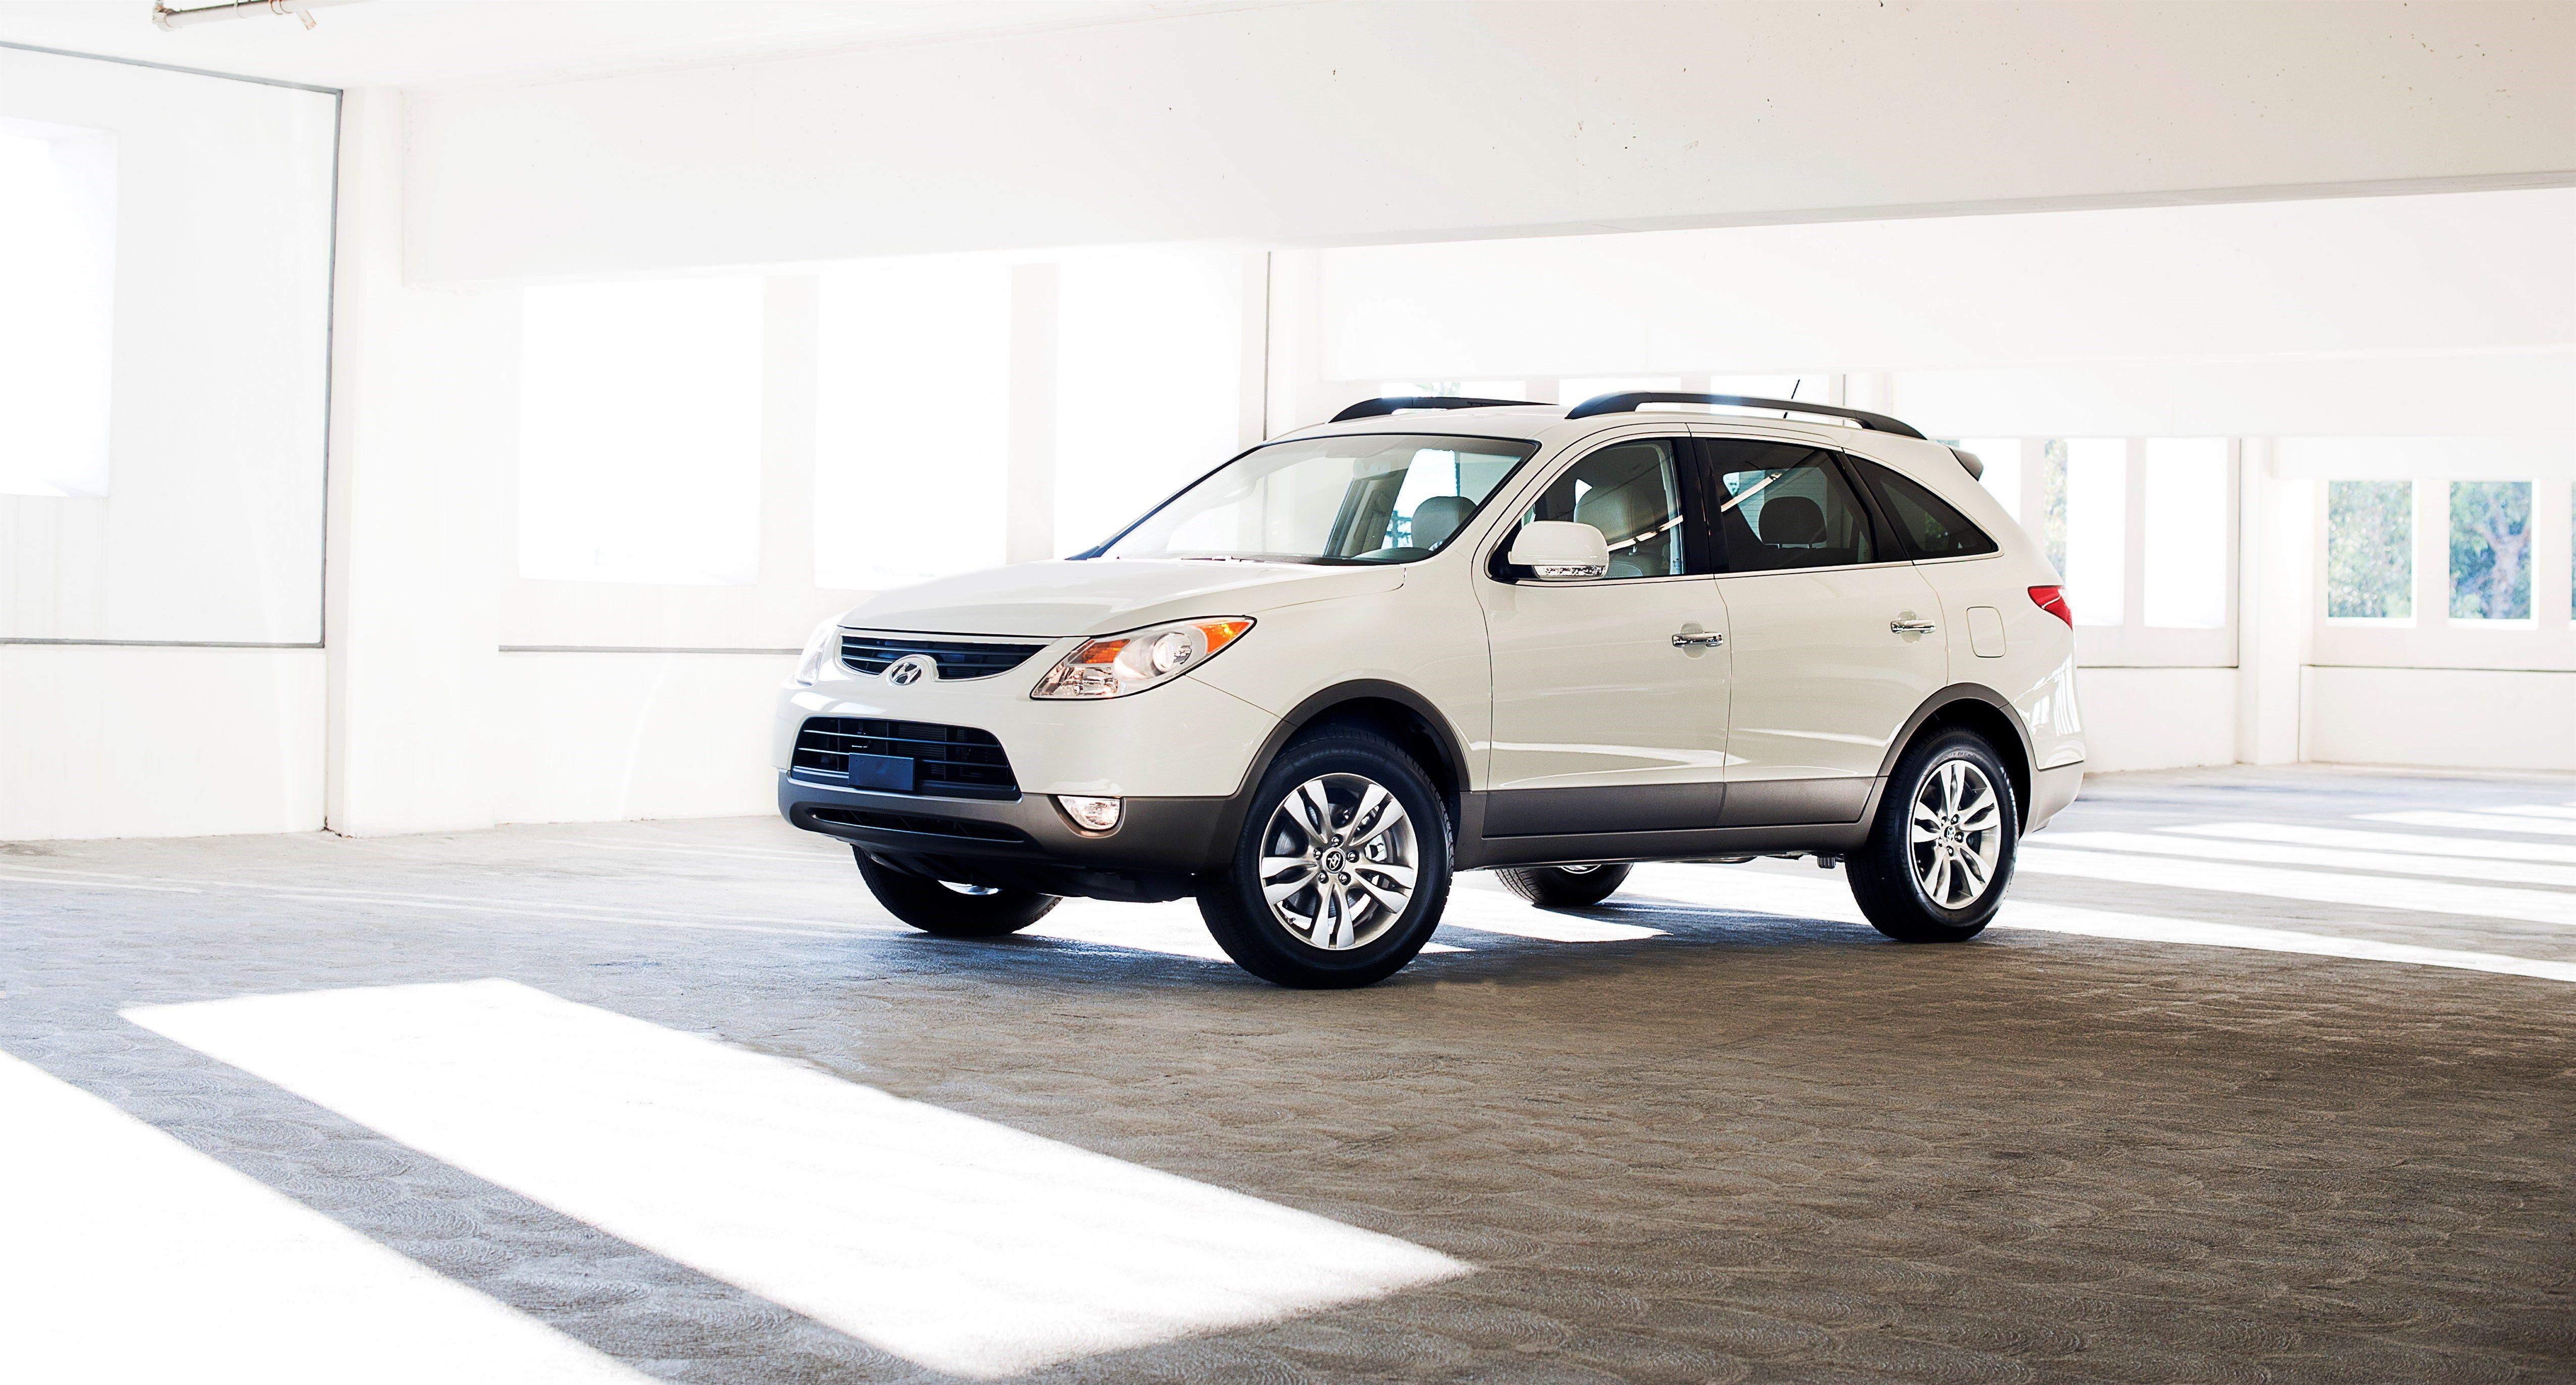 Hyundai Veracruz Review, Pricing and Specs